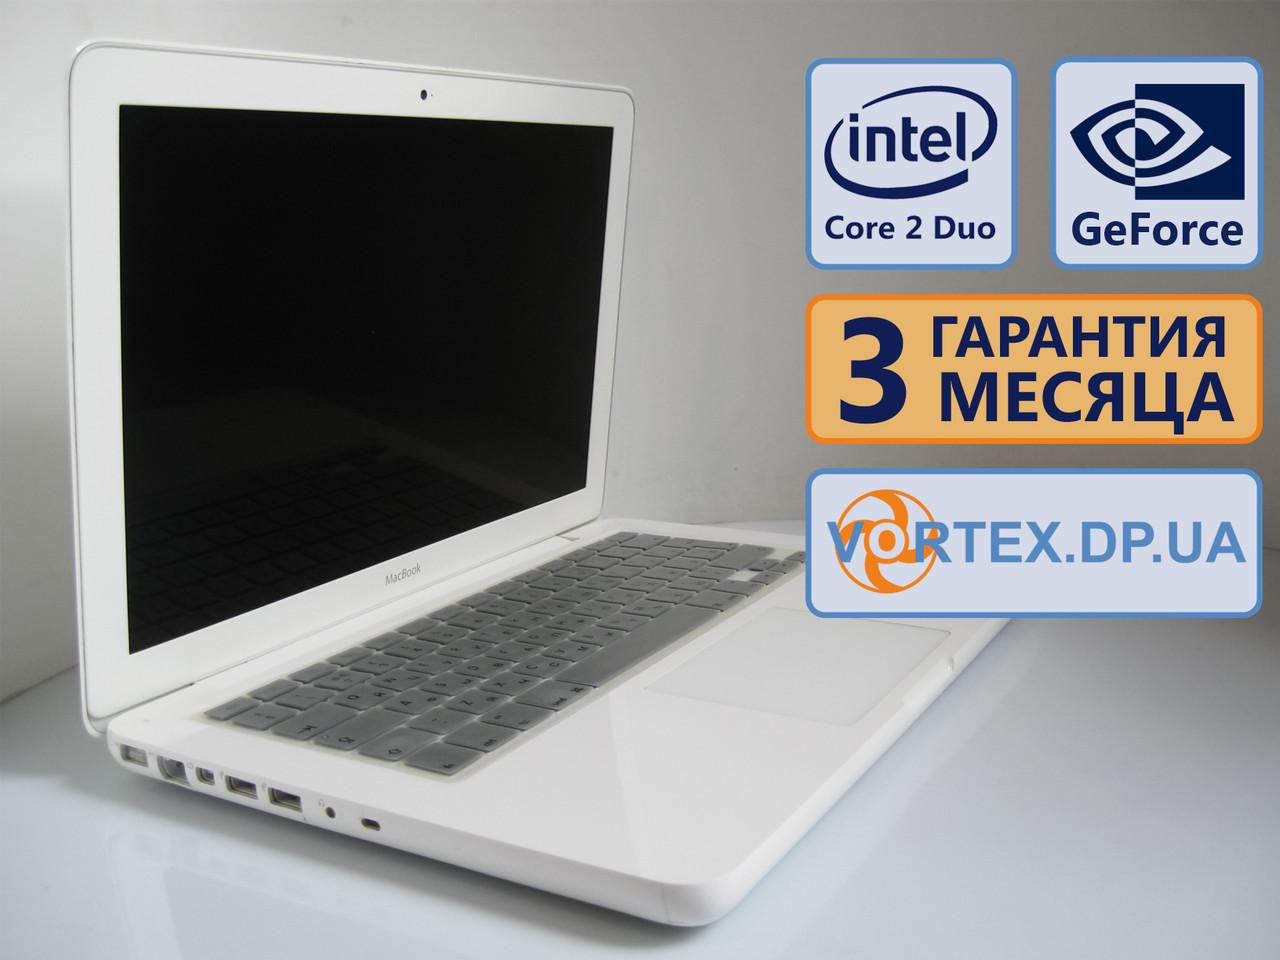 Ноутбук Apple A1342 mid2010 13.3  (1280x800) / Intel Core 2 Duo P8600 (2x2.4GHz) / GeForce 320M / RAM 4Gb / HDD 250Gb / АКБ нет / Сост. 9/10 БУ